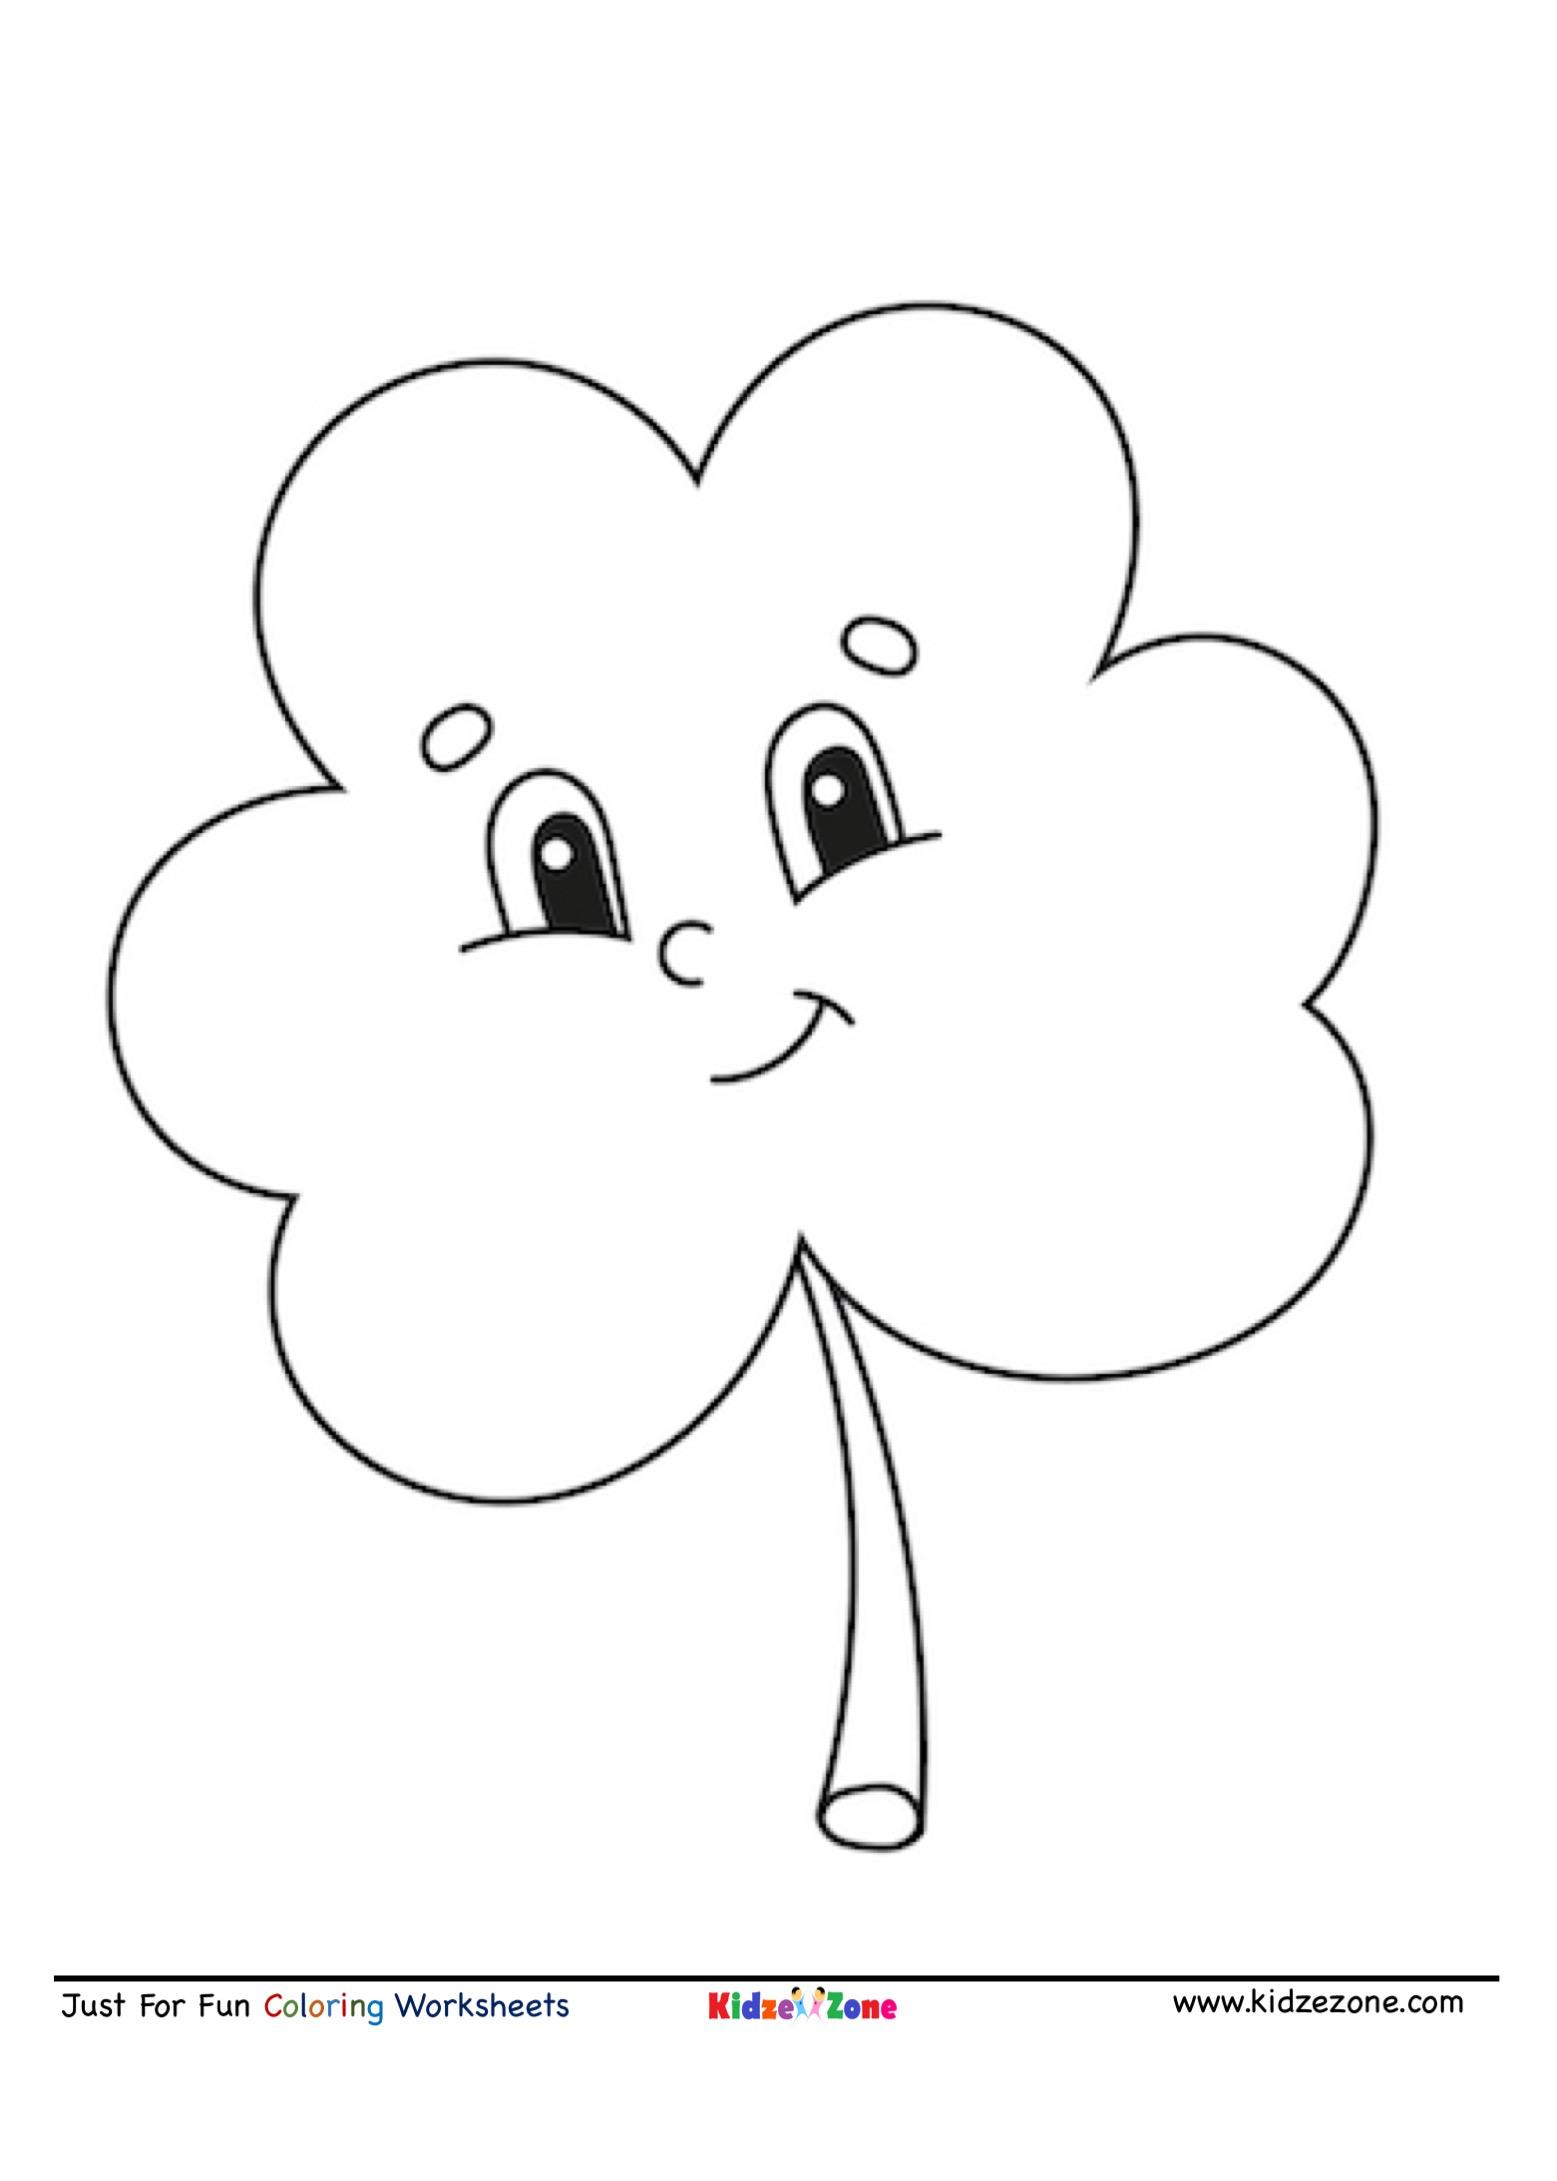 Leaf Cartoon Coloring Page